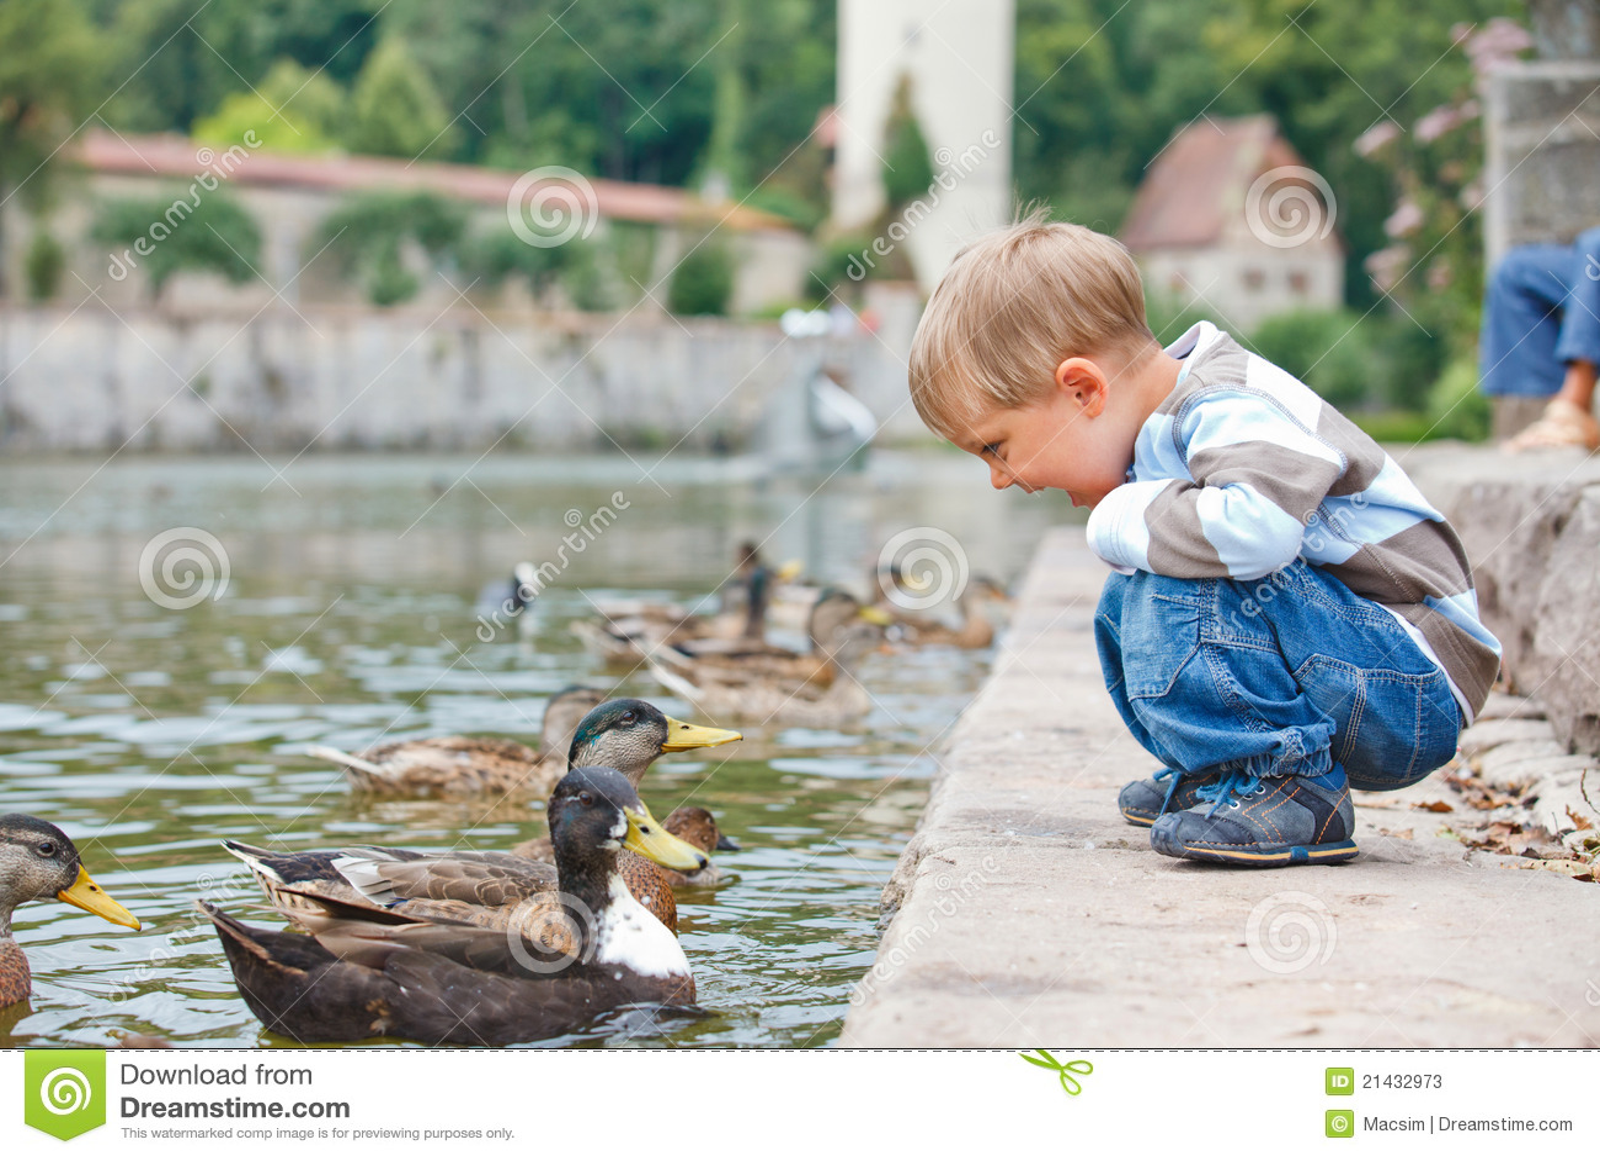 Creampie Feeding the ducks